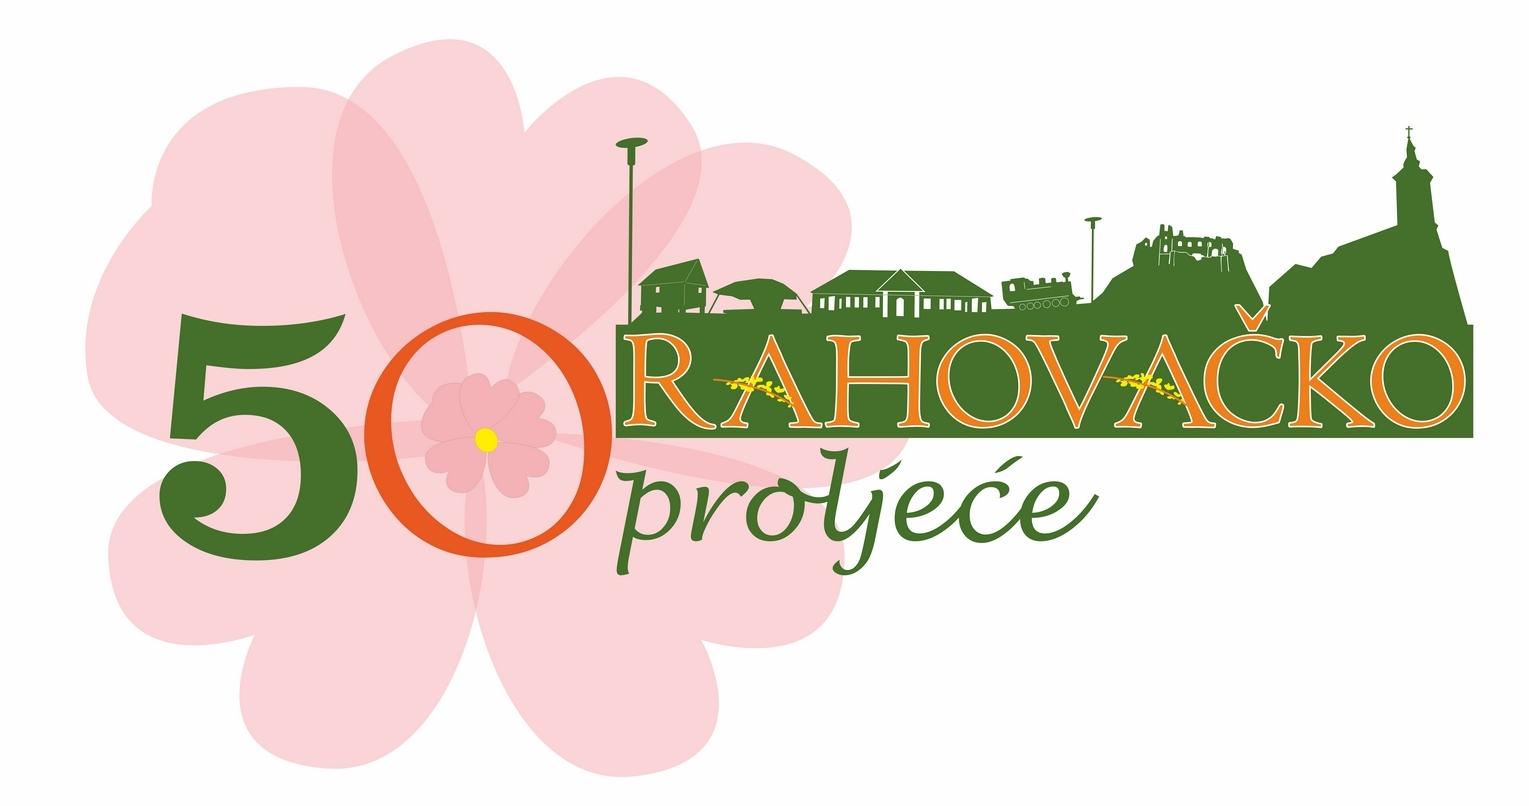 Orahovacko Proljece novi logo RADNI003 03